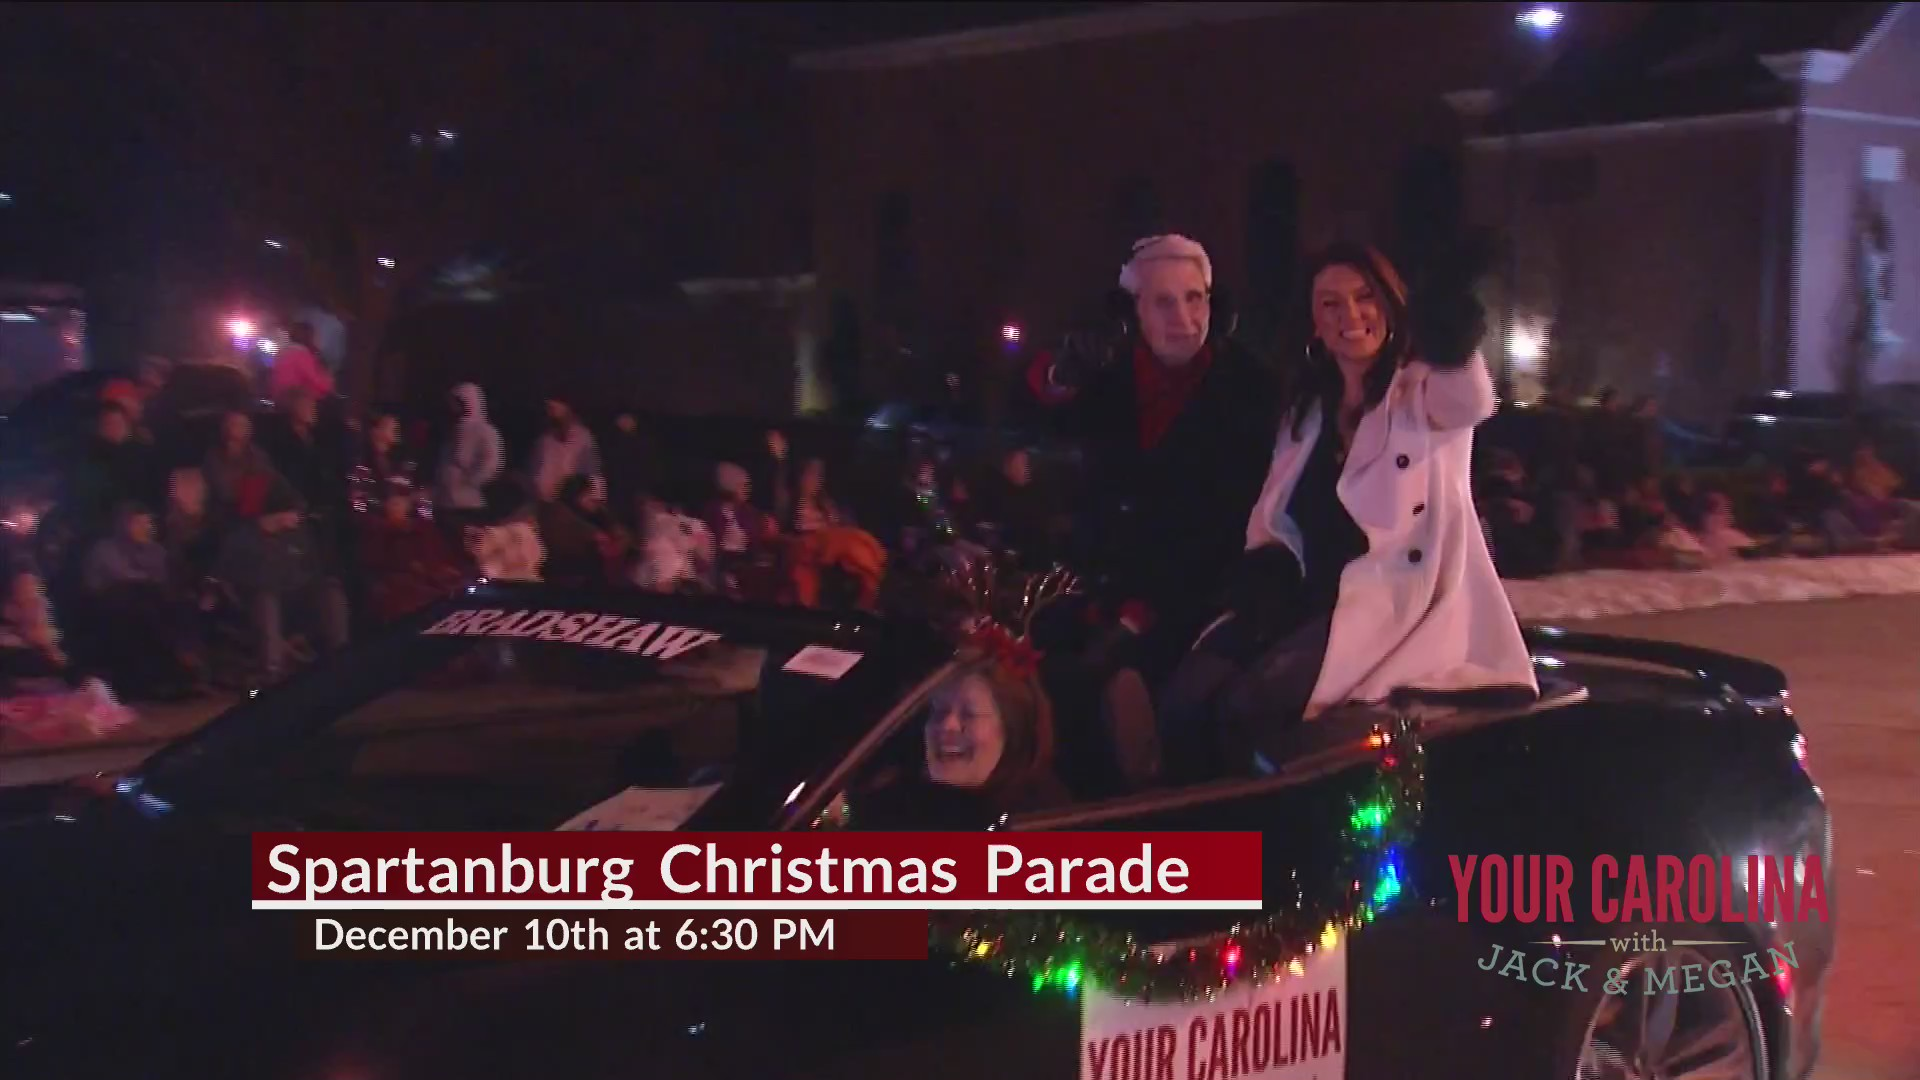 2019 Spartanburg Christmas Parade